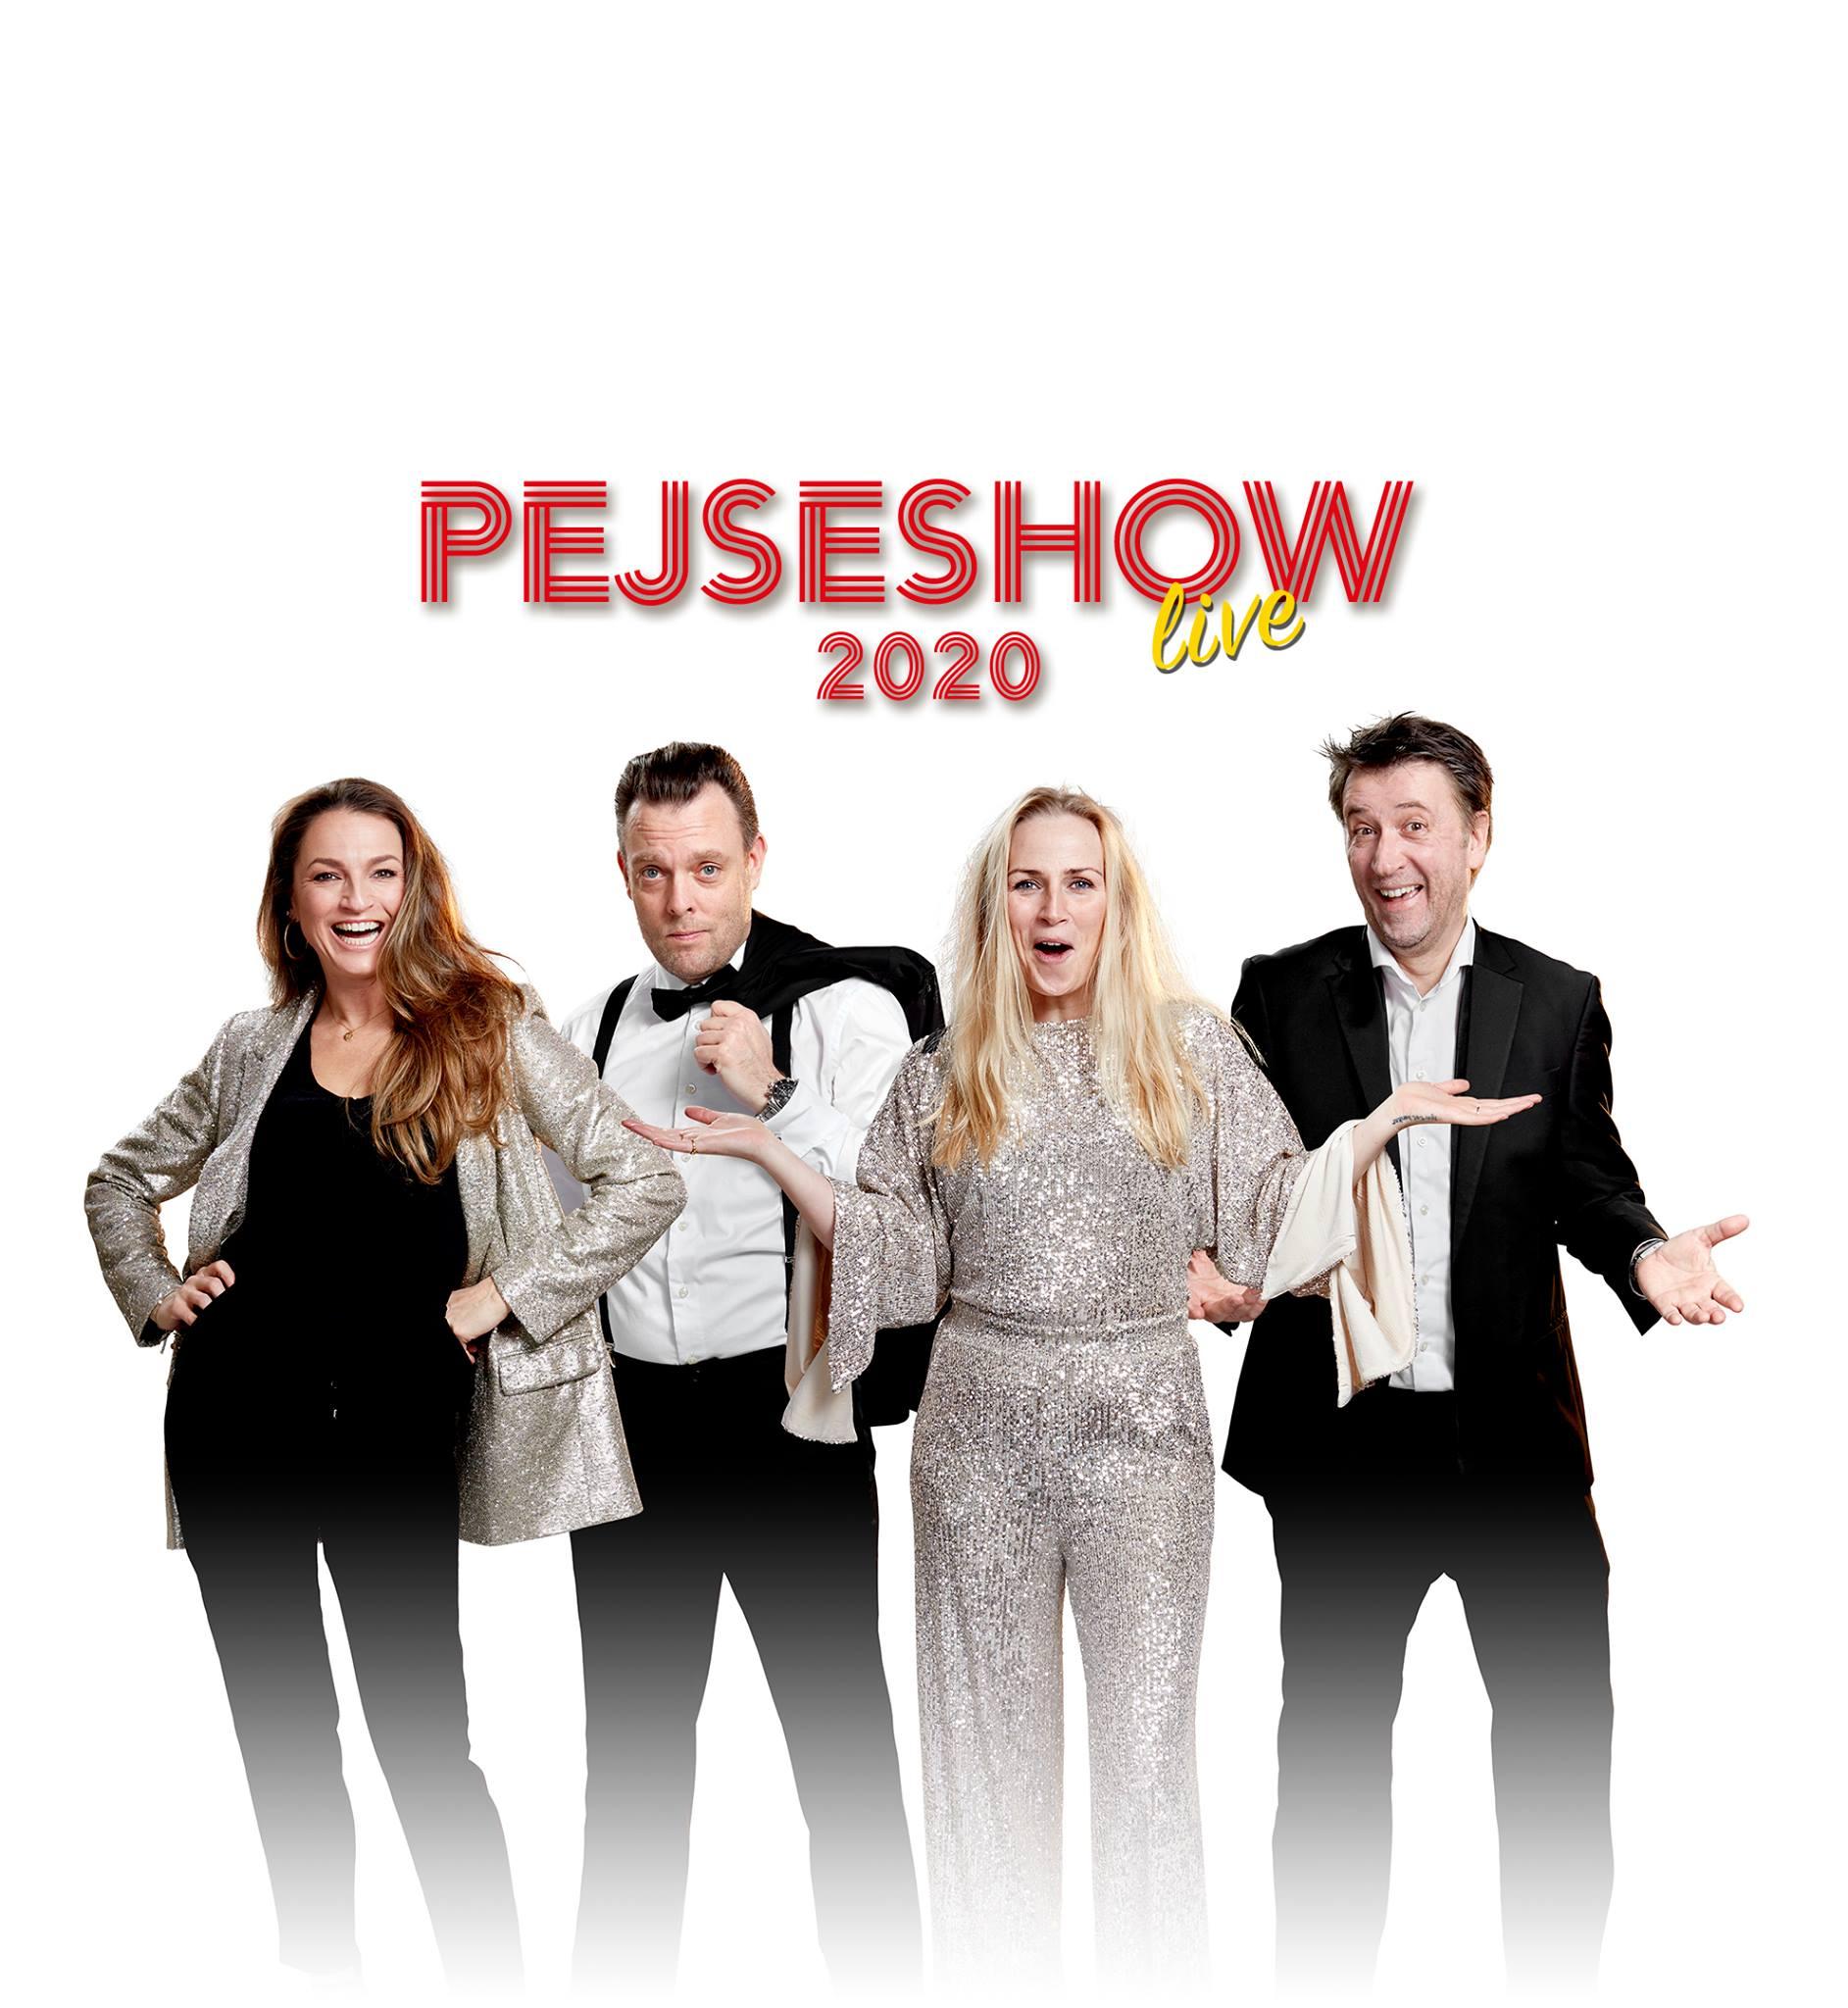 Anmeldelse: Pejseshow 2020: Late Night, Hotel Pejsegården (Pejseshow)